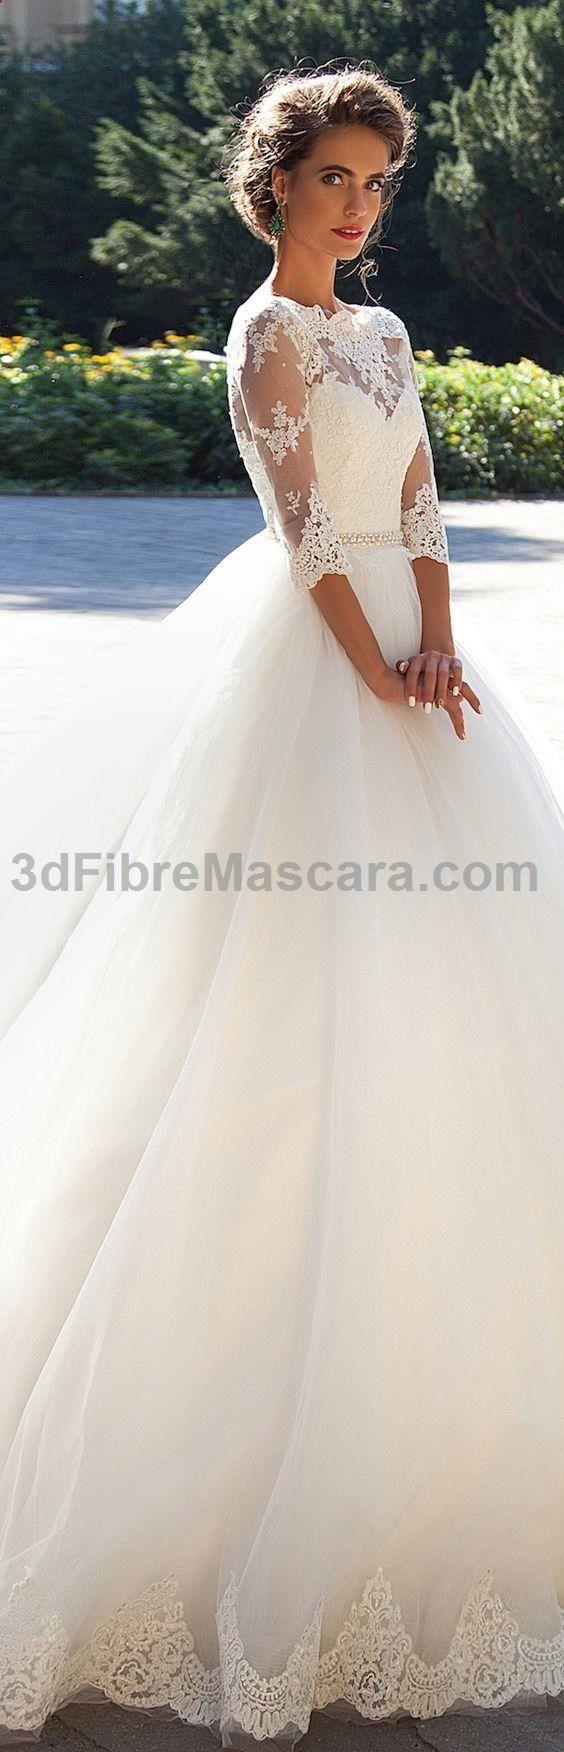 Milla Nova 2016 off shoulder winter wedding dress / www.himisspuff.co... #weddings #wedding #marriage #weddingdress #weddinggown #ballgowns #ladies #woman #women #beautifuldress #newlyweds #proposal #shopping #engagement